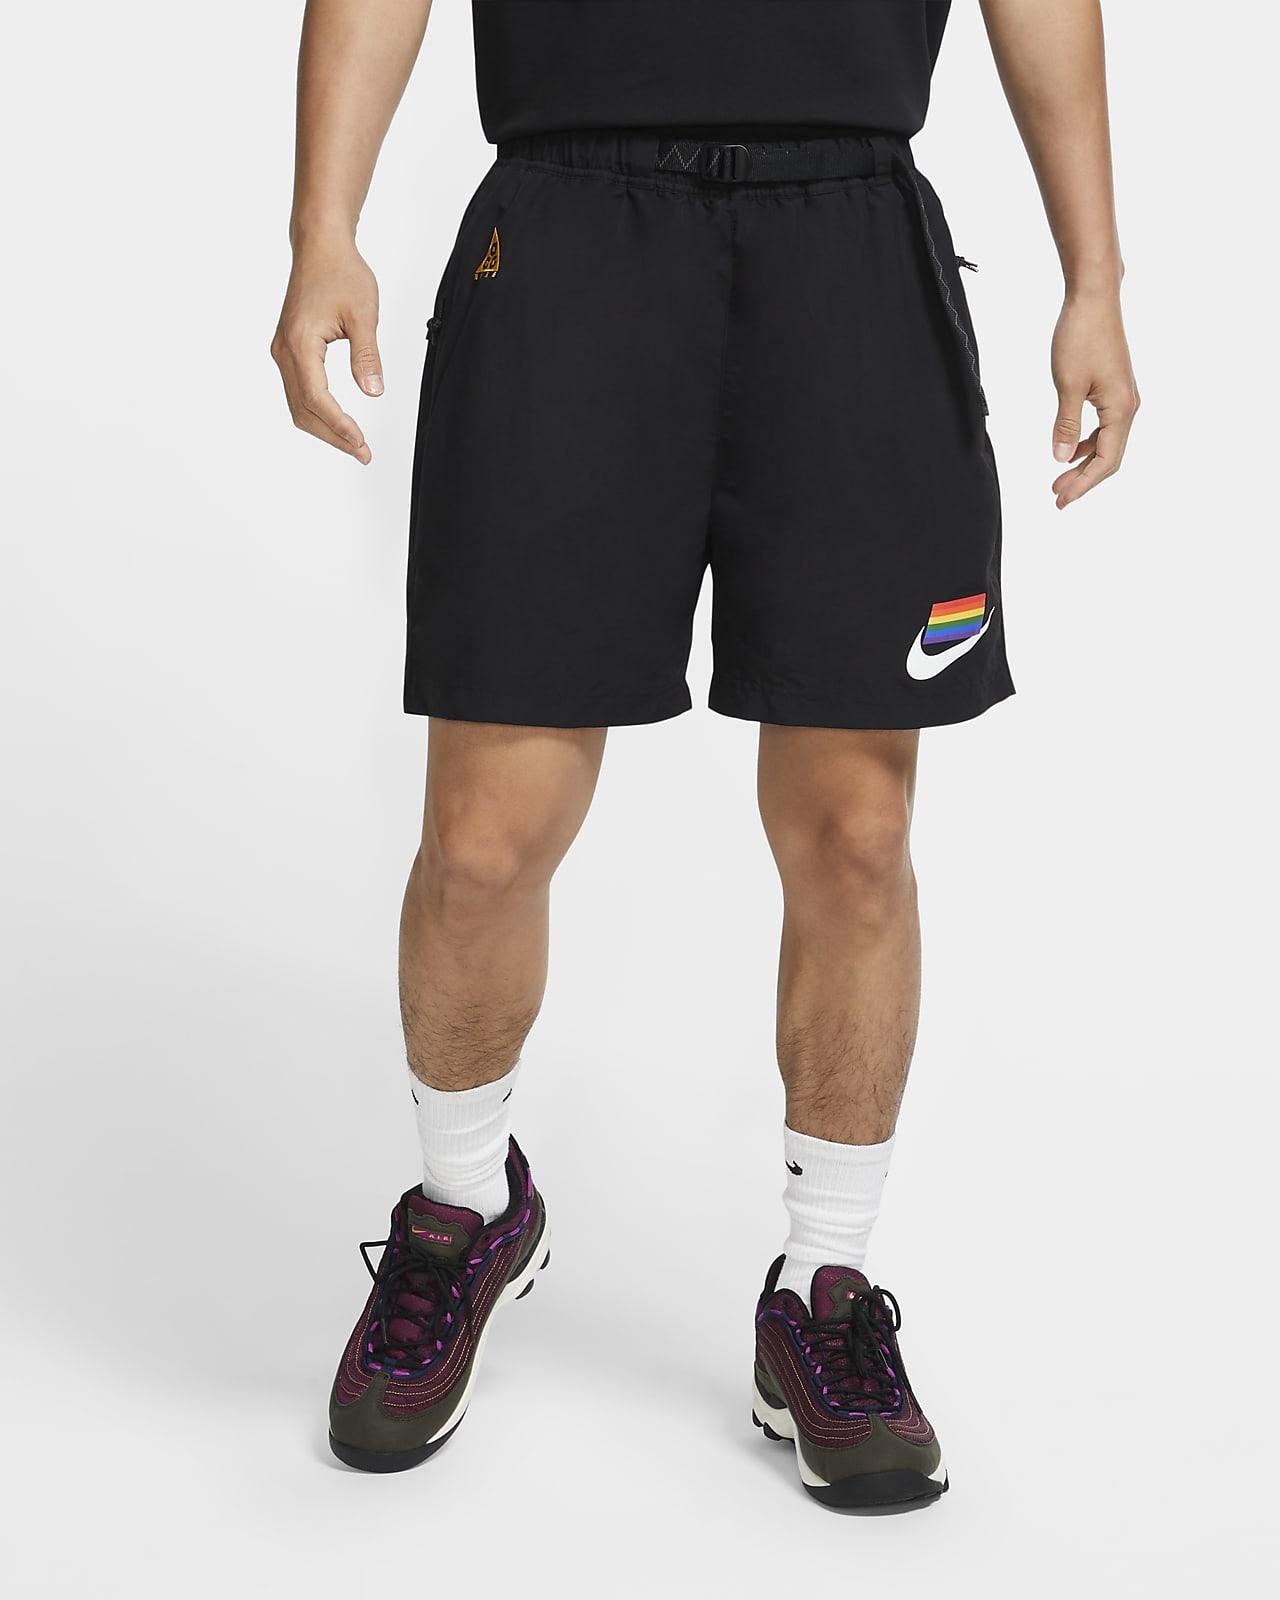 Nike BETRUE vevd shorts